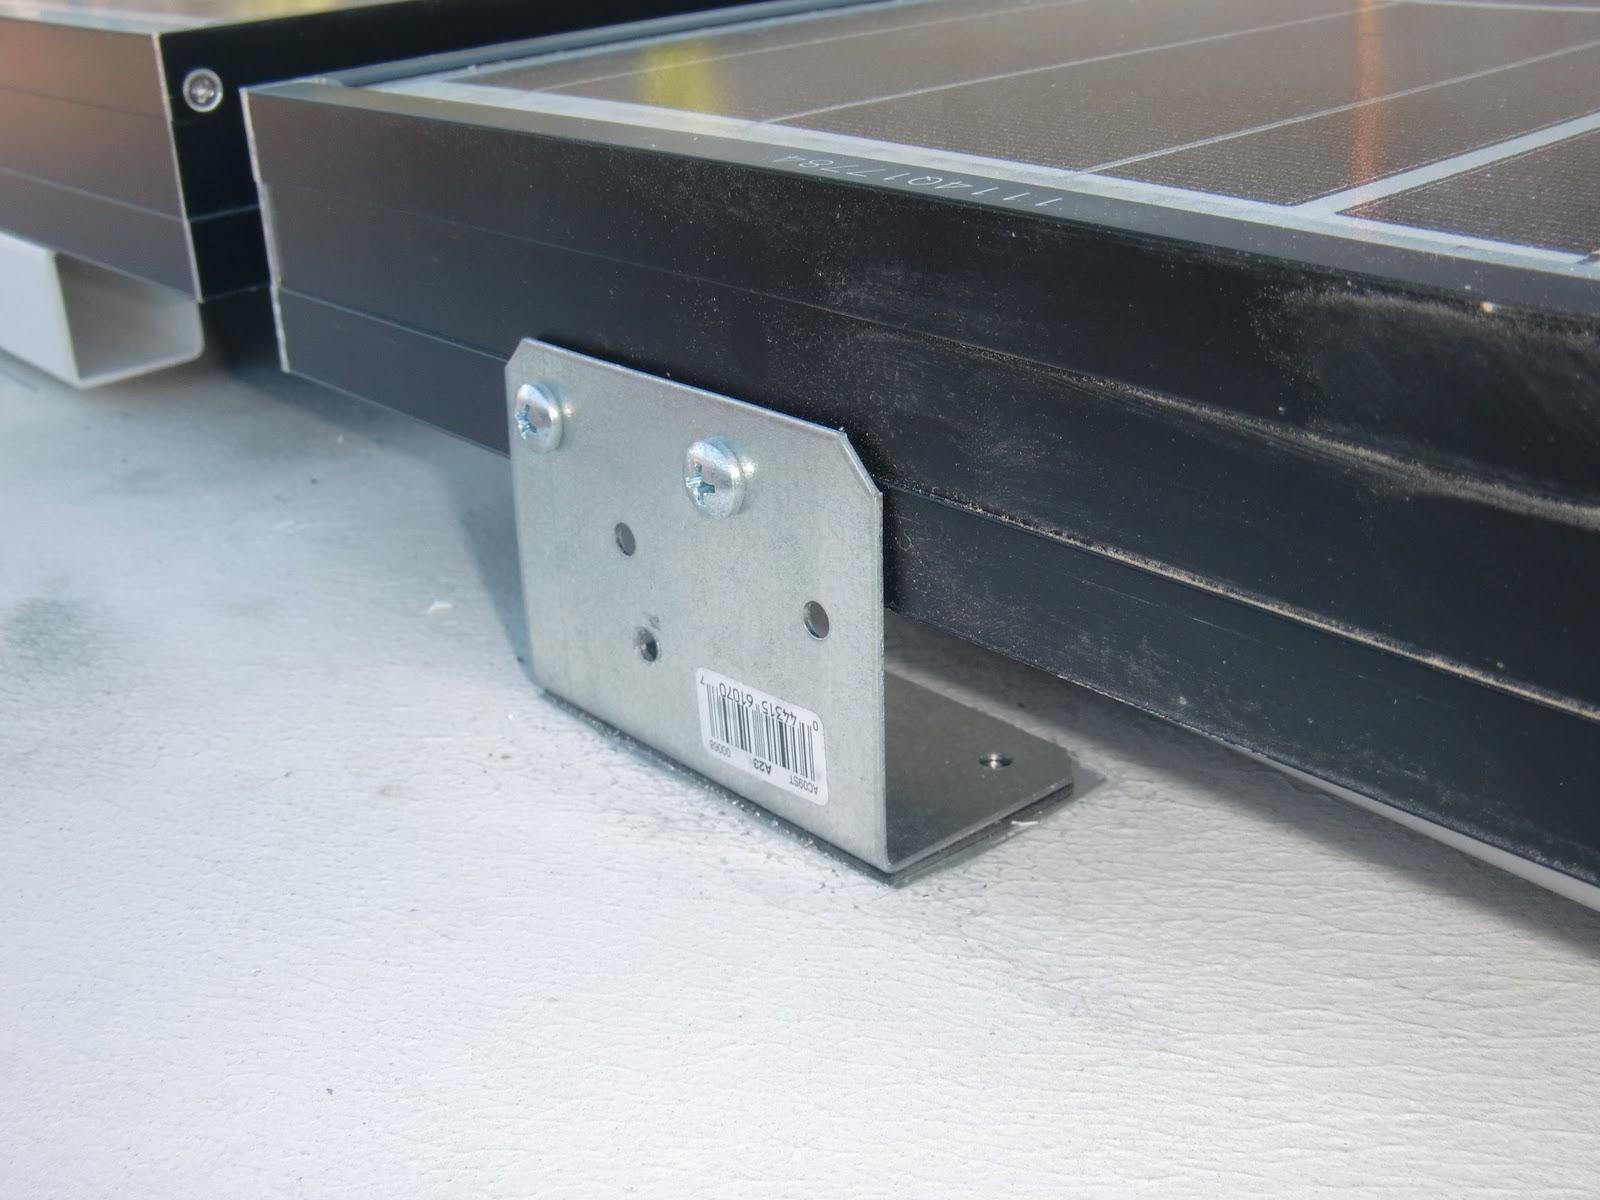 haulmark trailer wiring harness haulmark image wiring diagram for haulmark trailer the wiring diagram on haulmark trailer wiring harness